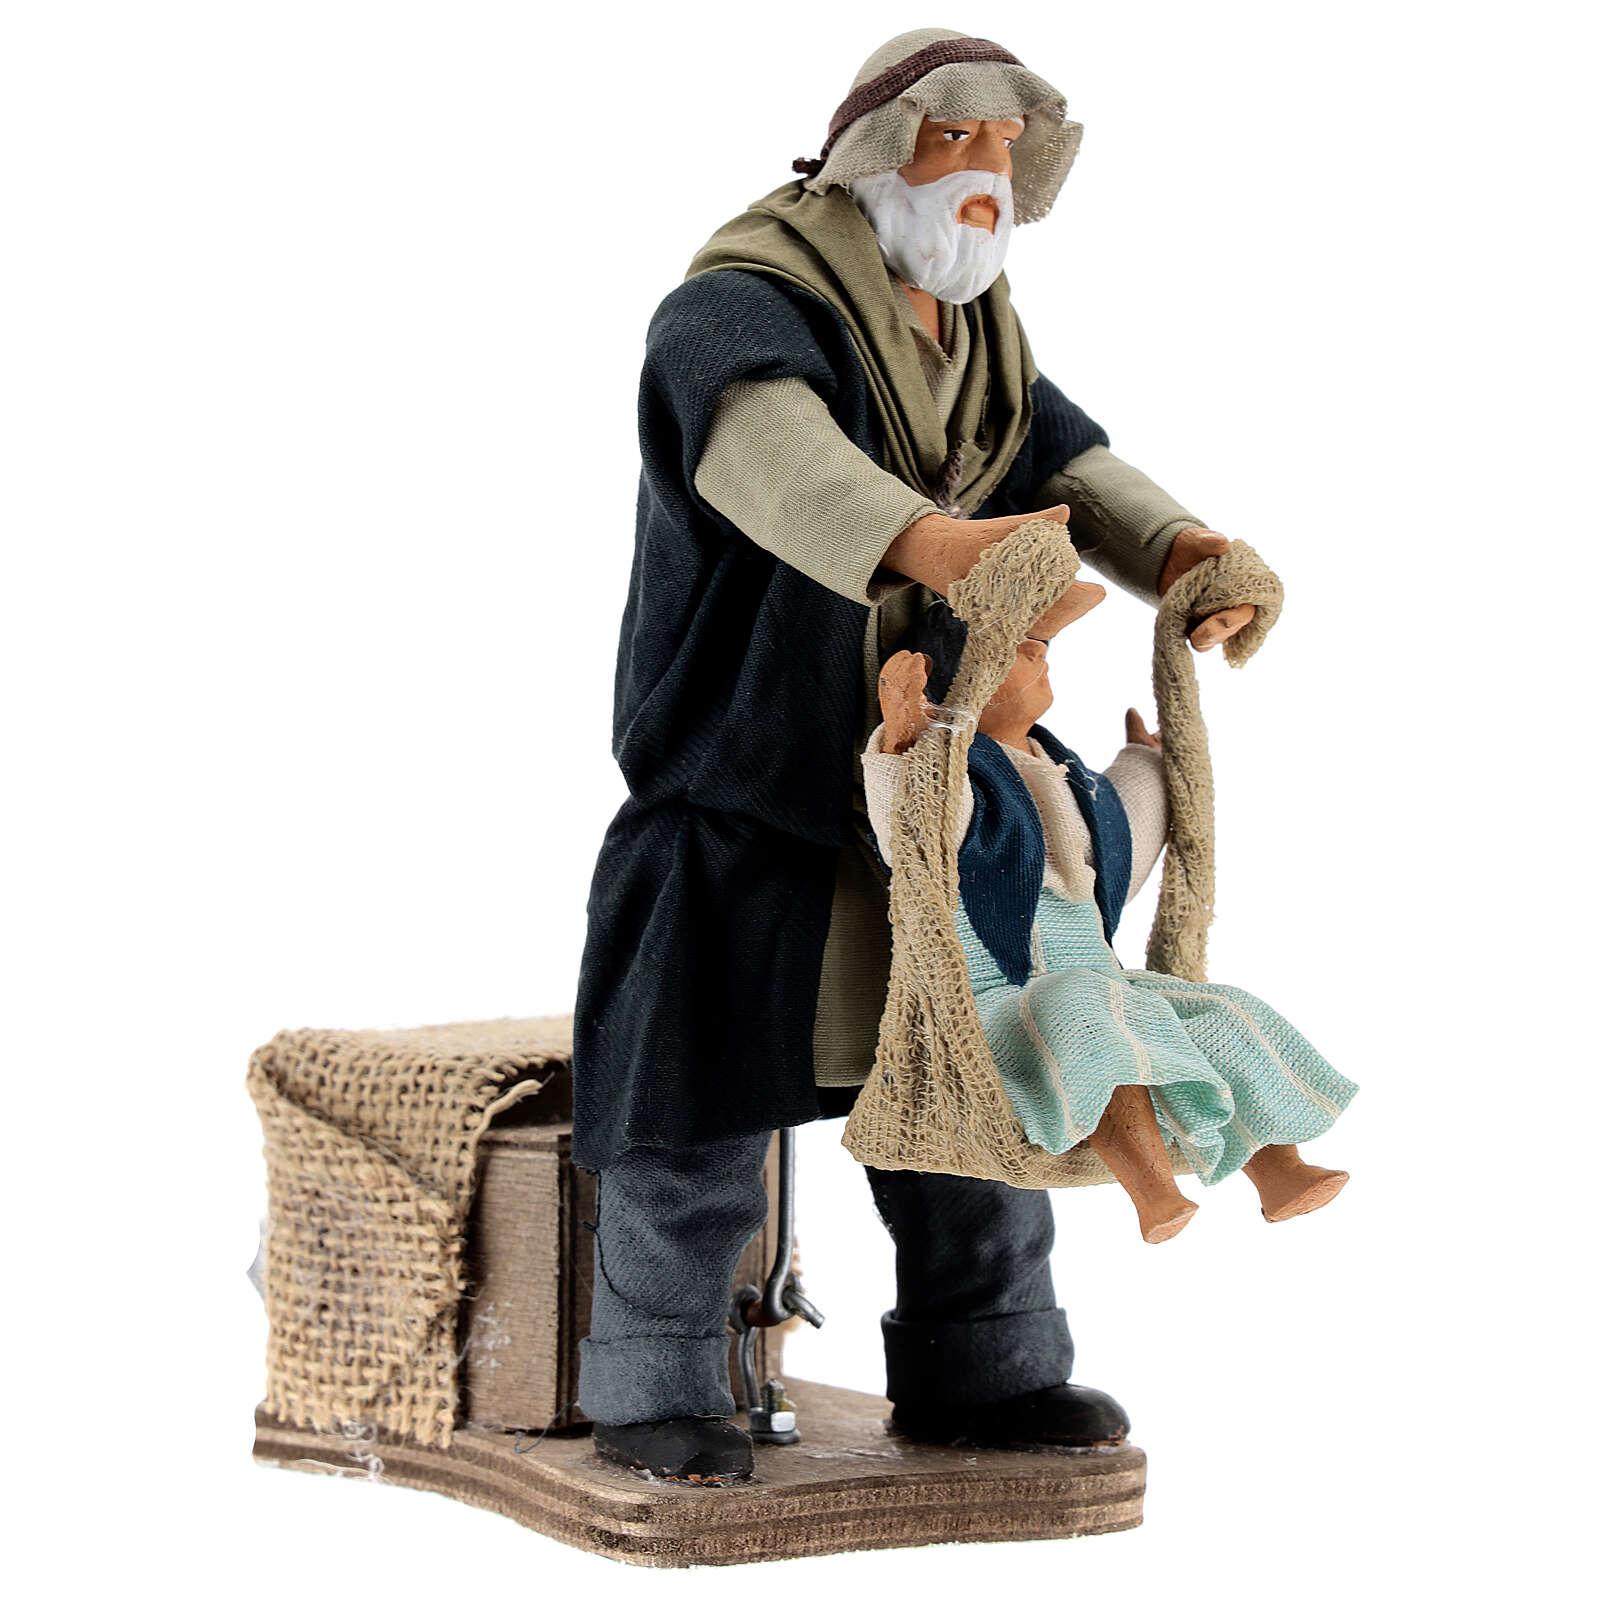 Movimiento hombre que juega con niña Nápoles 14 cm 4